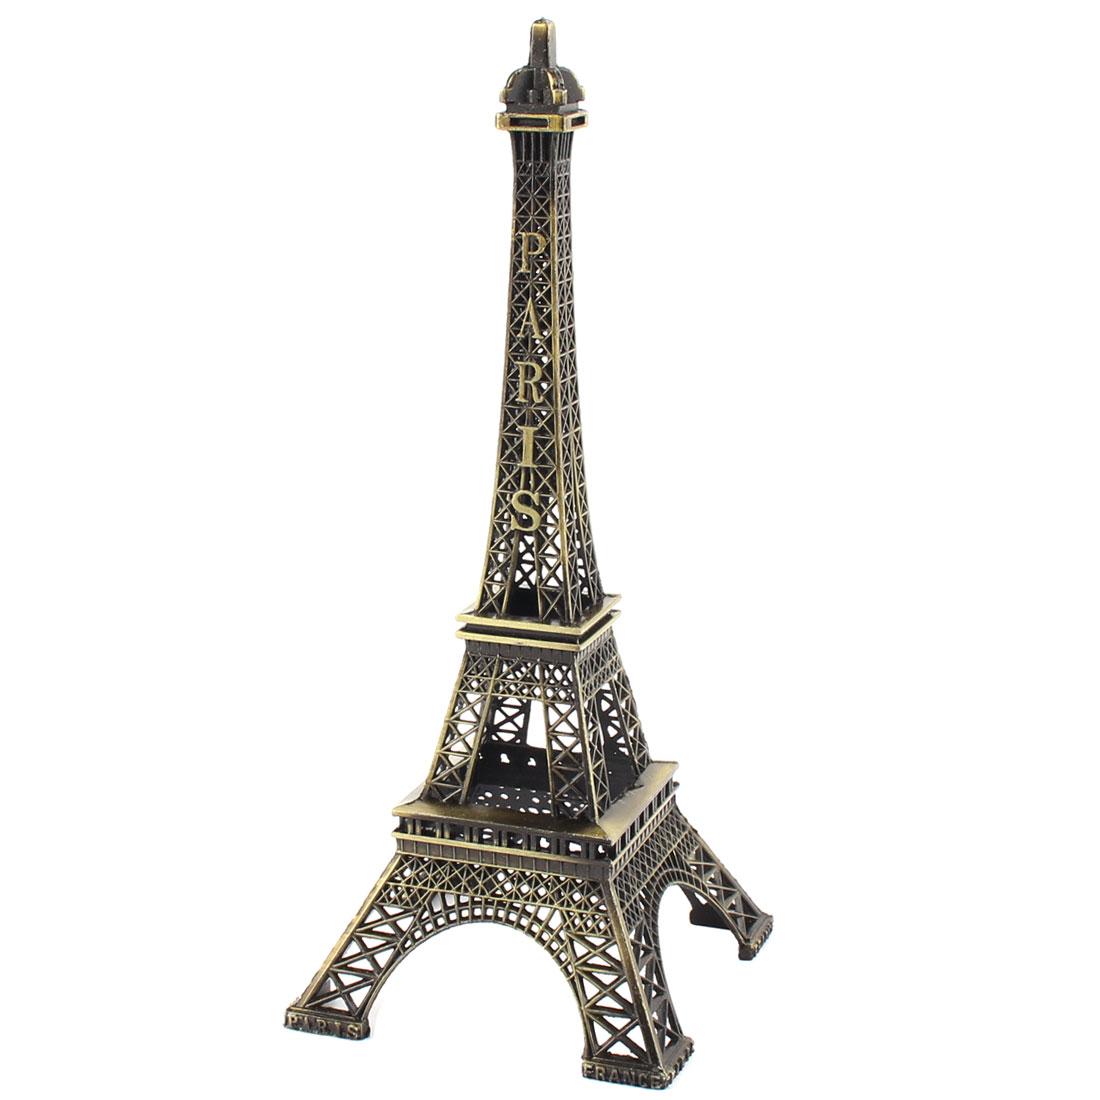 Paris Eiffel Tower Miniature Statue Model Decoration Bronze Tone 7.1 Inch High